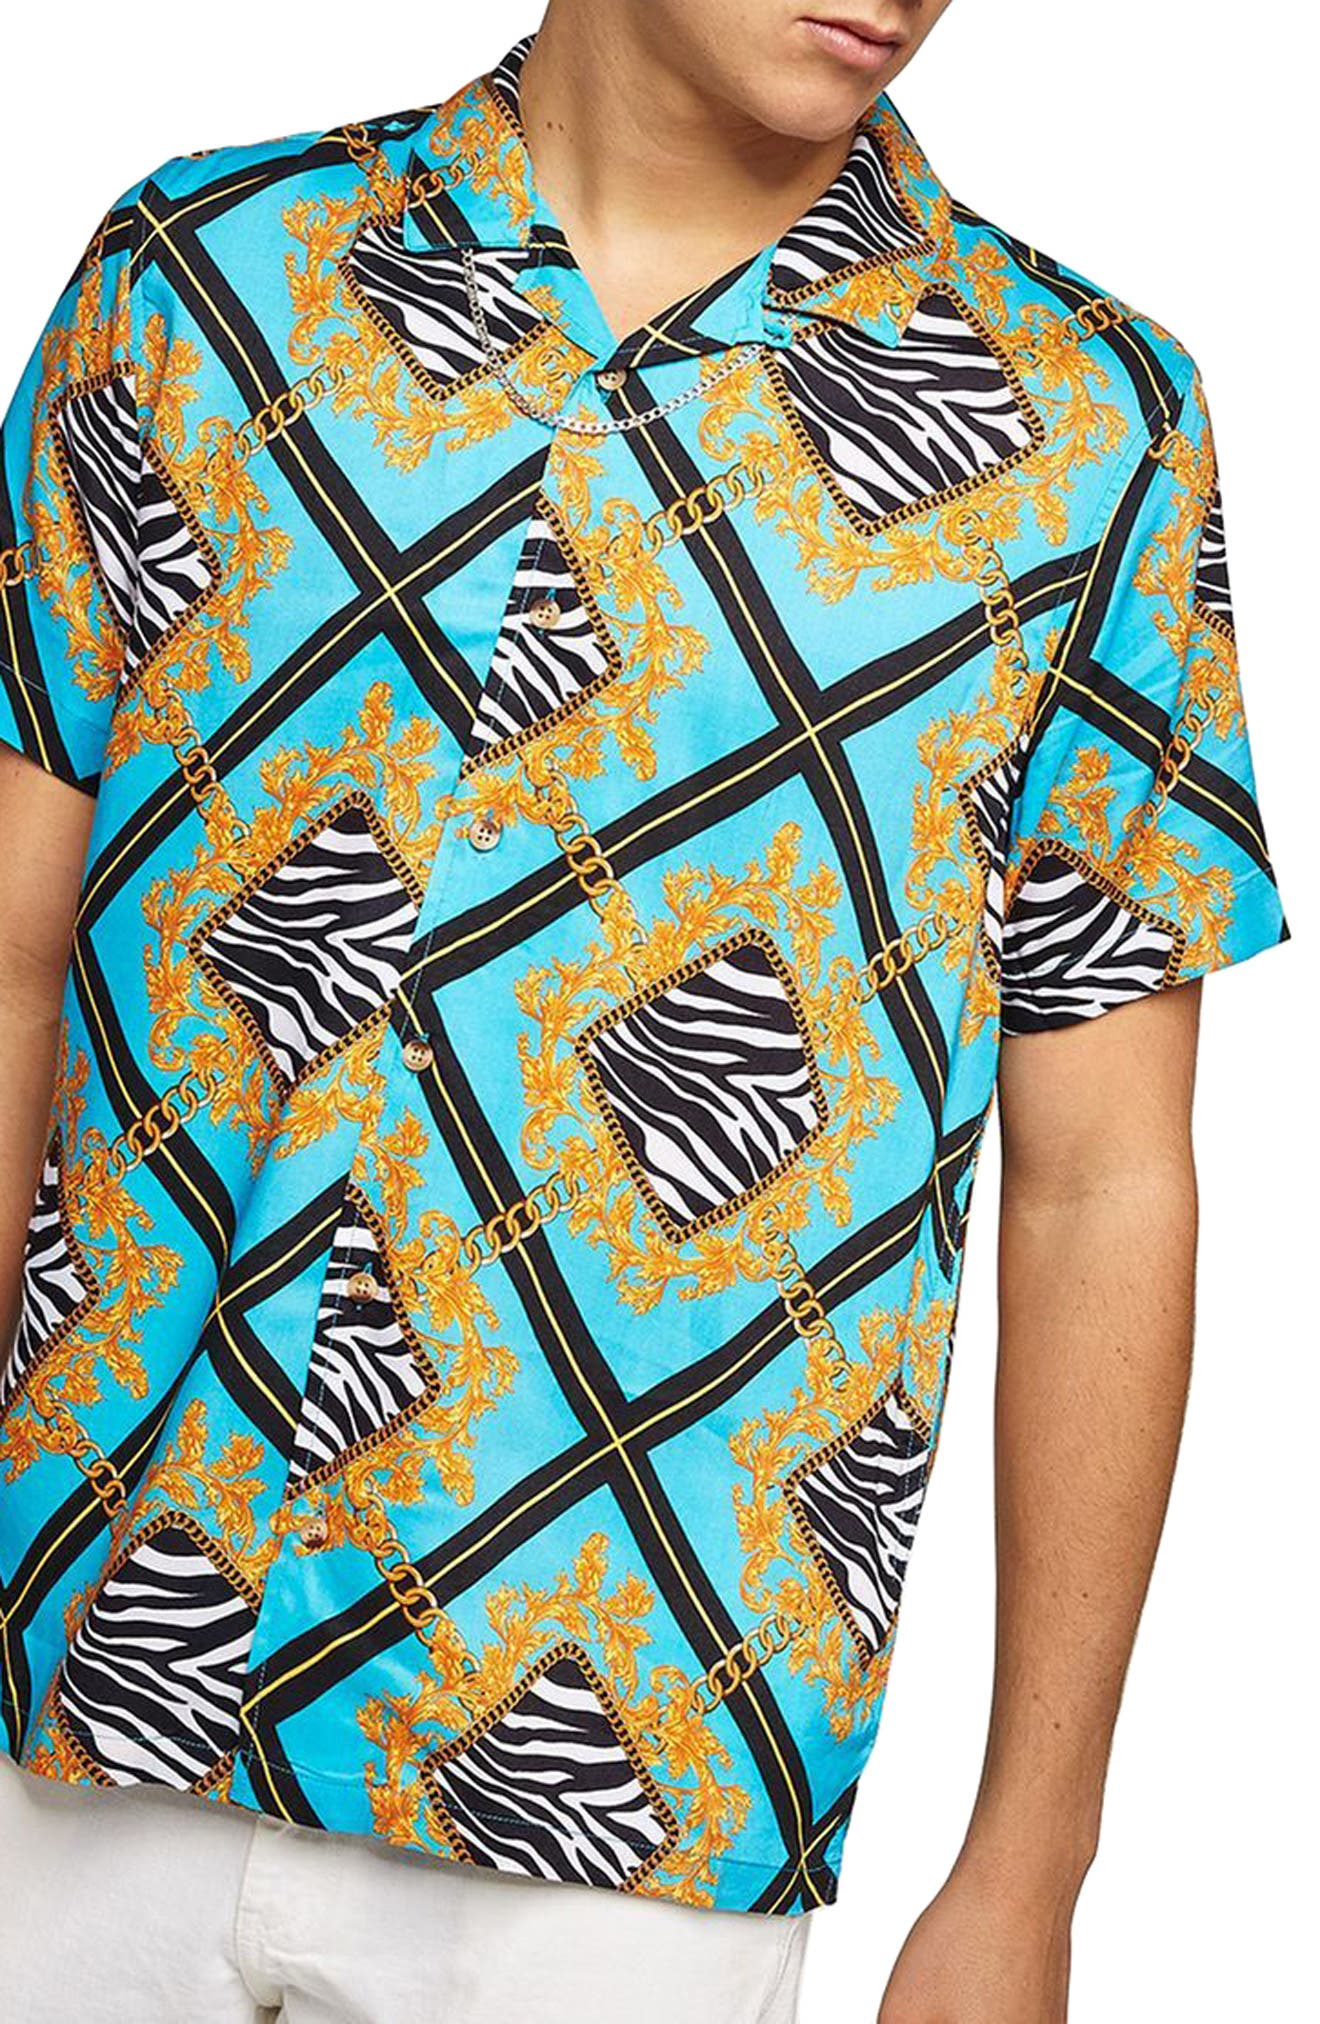 Baroque Zebra Print Shirt,                             Main thumbnail 1, color,                             400